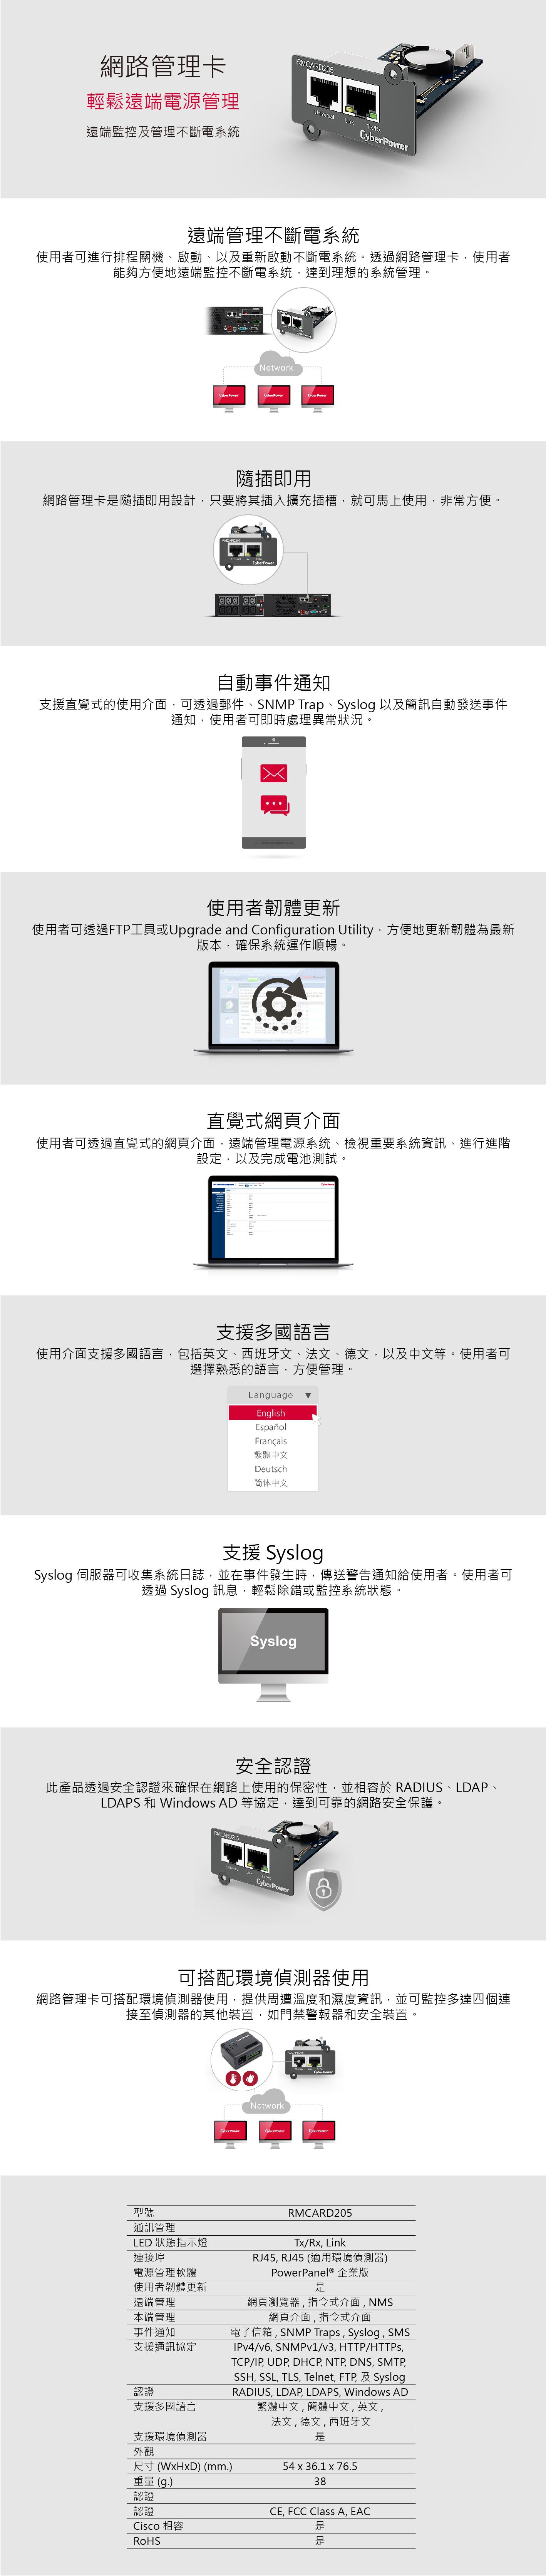 Cyberpower RMCARD205 網路管理卡 商品介紹